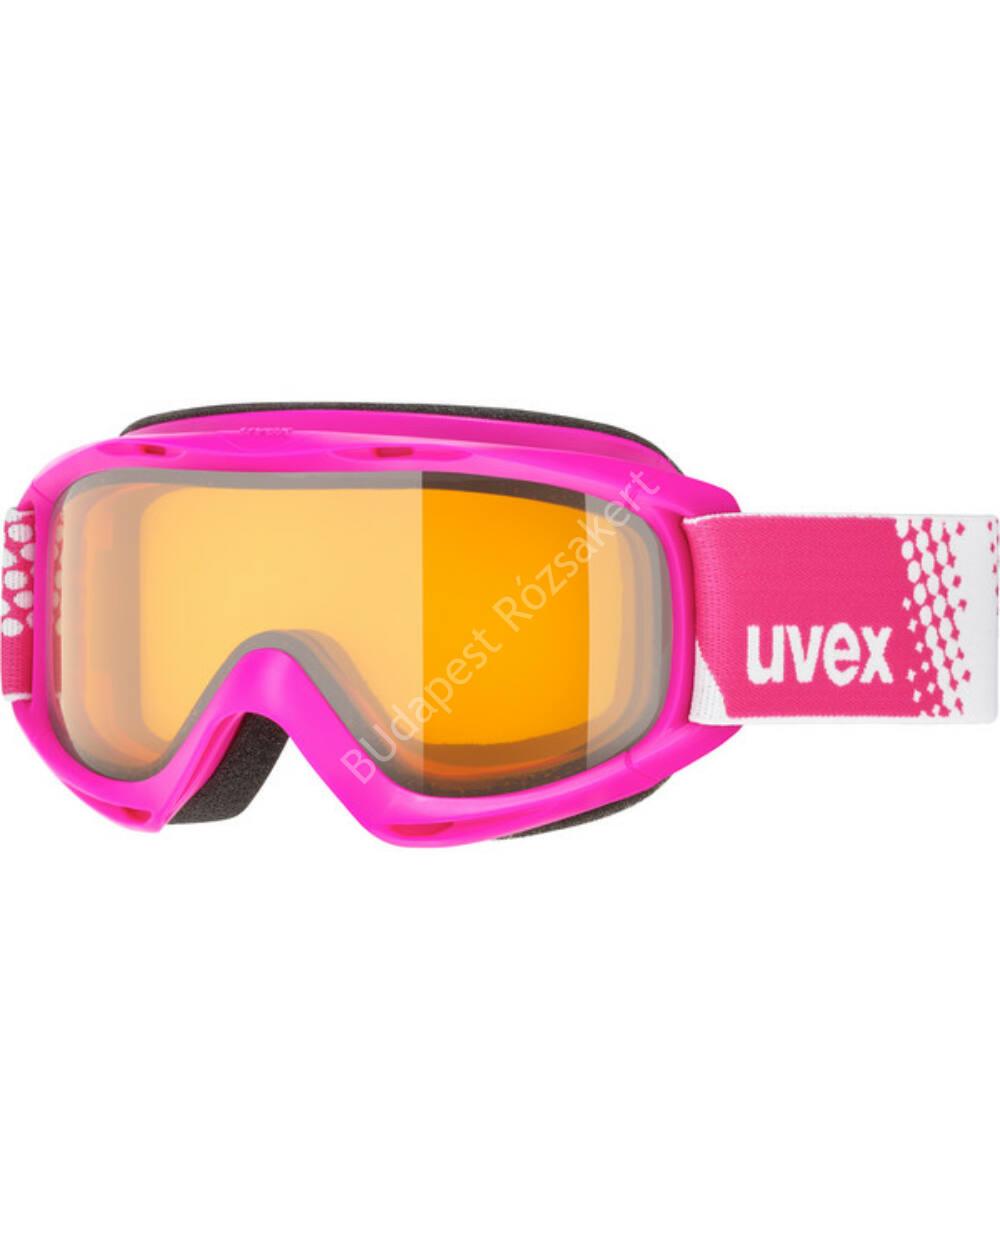 Uvex slider LGL síszemüveg, pink